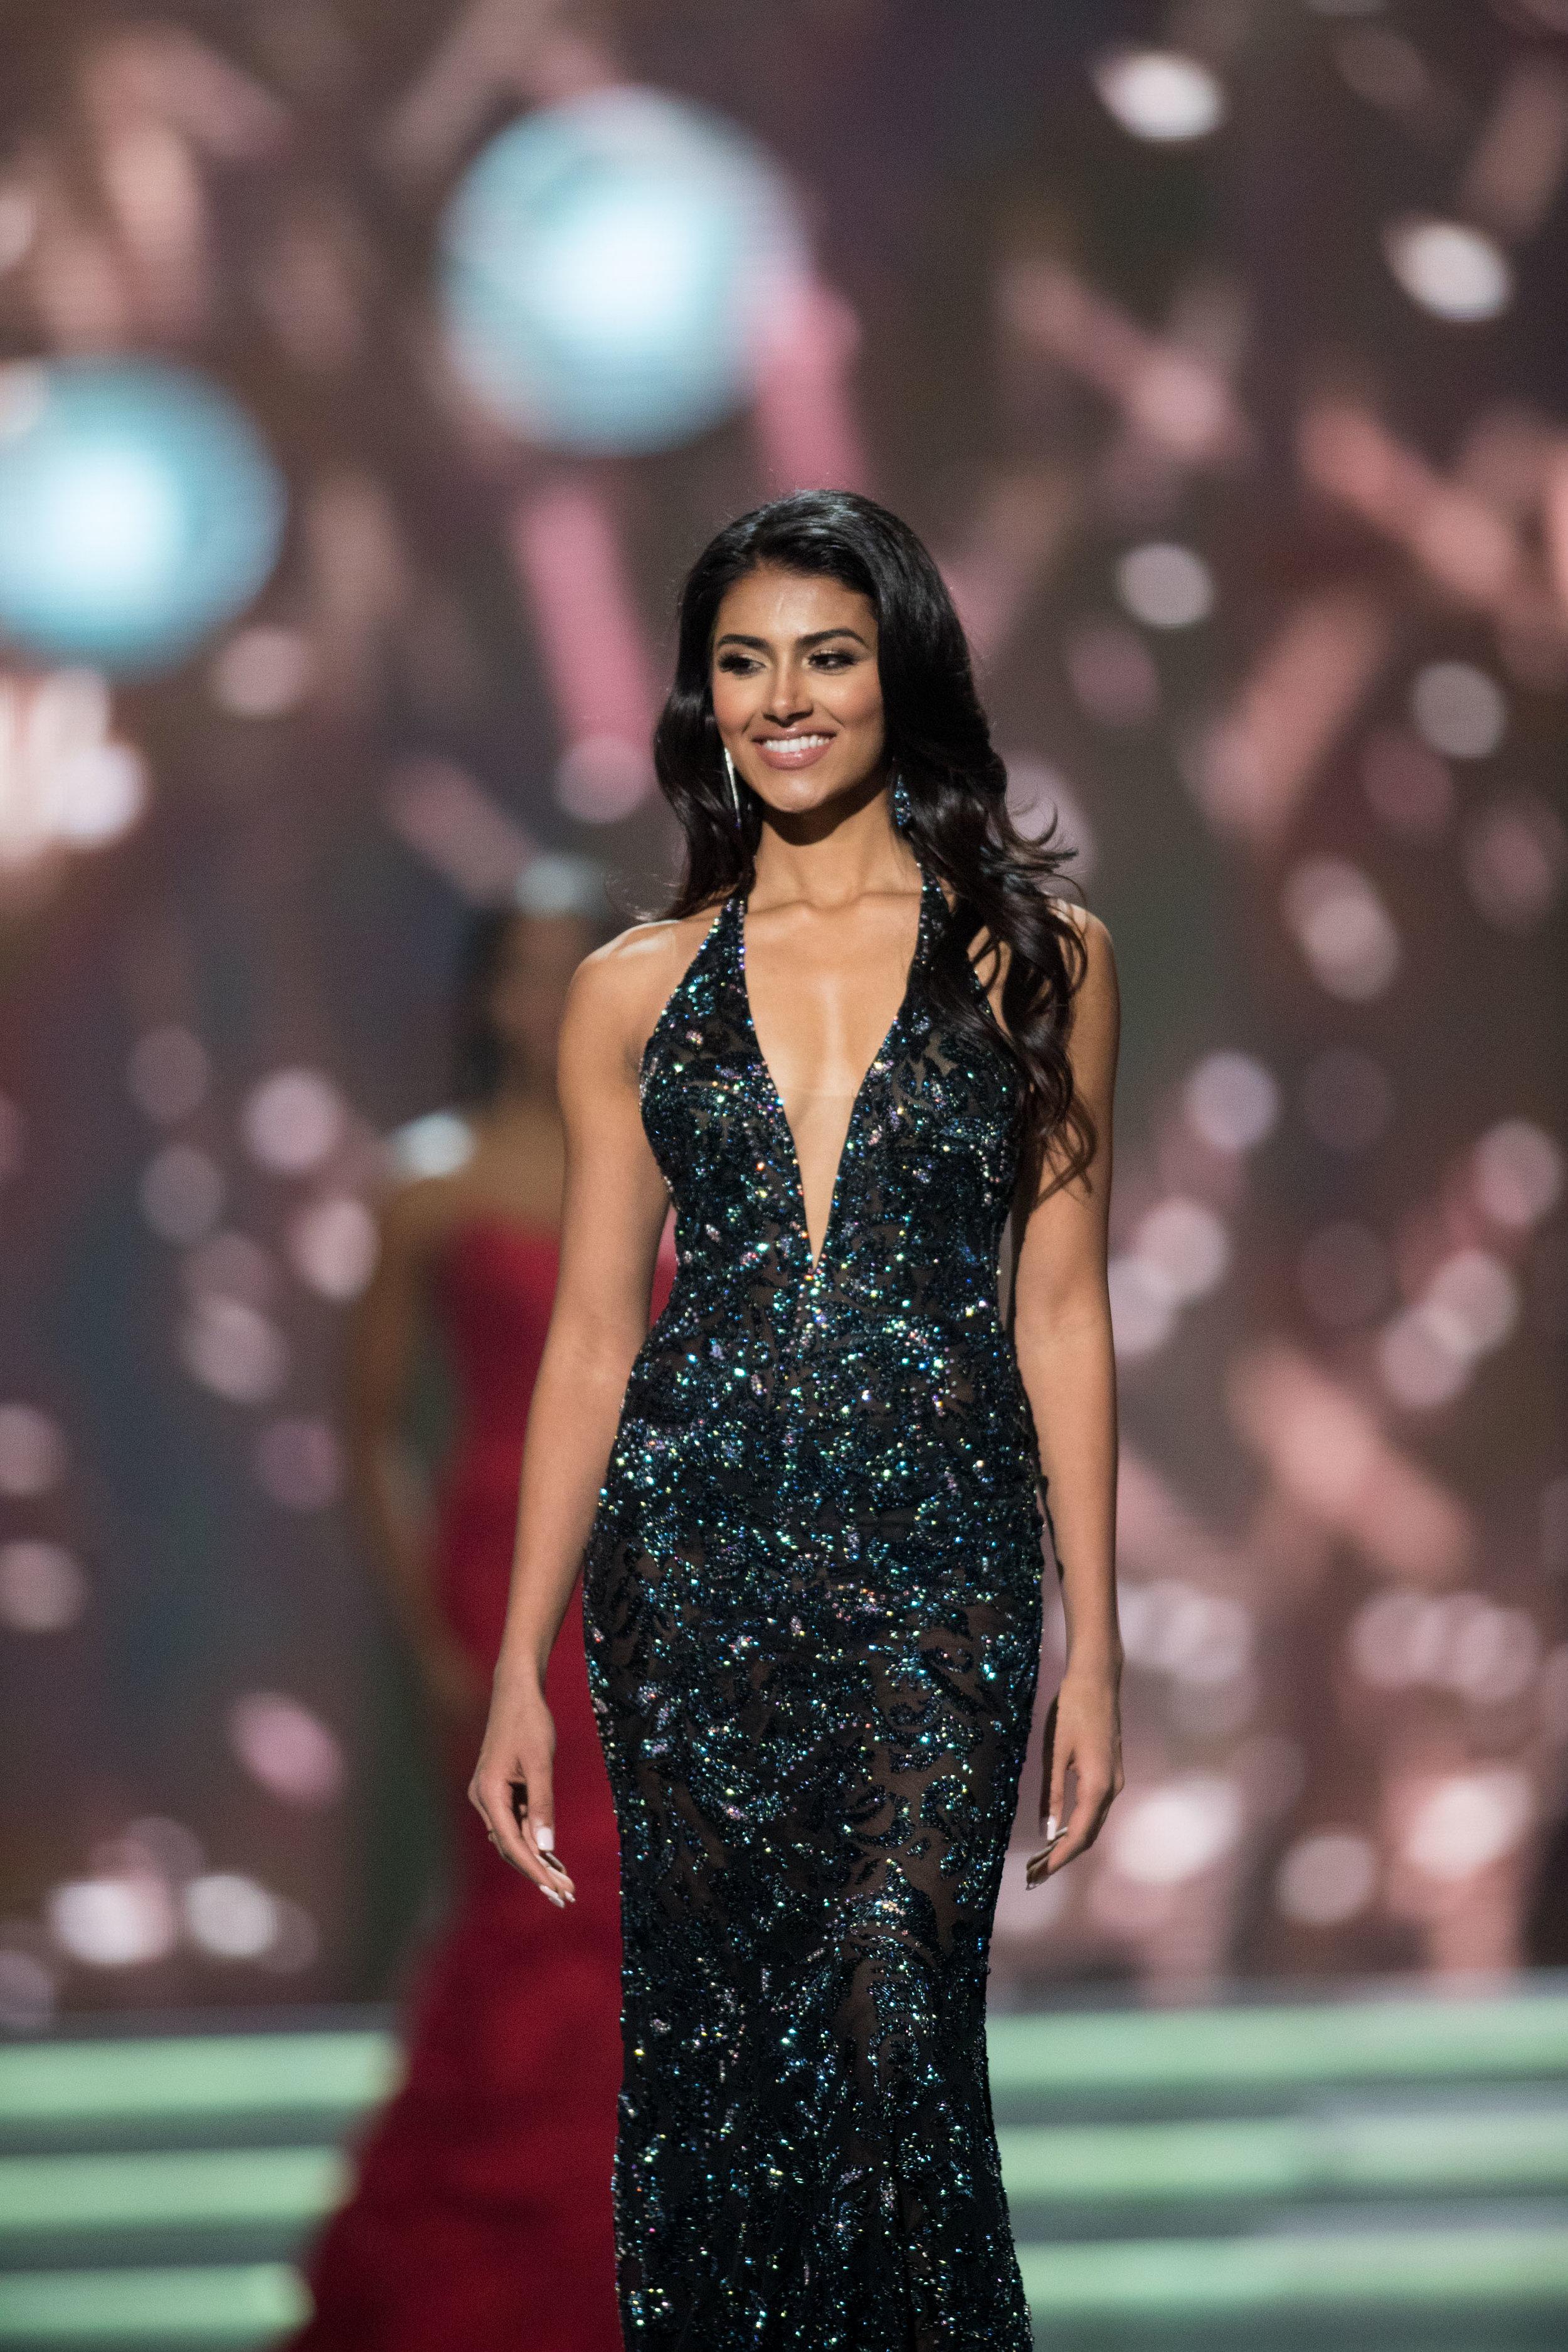 Chhavi Verg, Miss New Jersey USA 2017. Patrick Prather for Miss USA